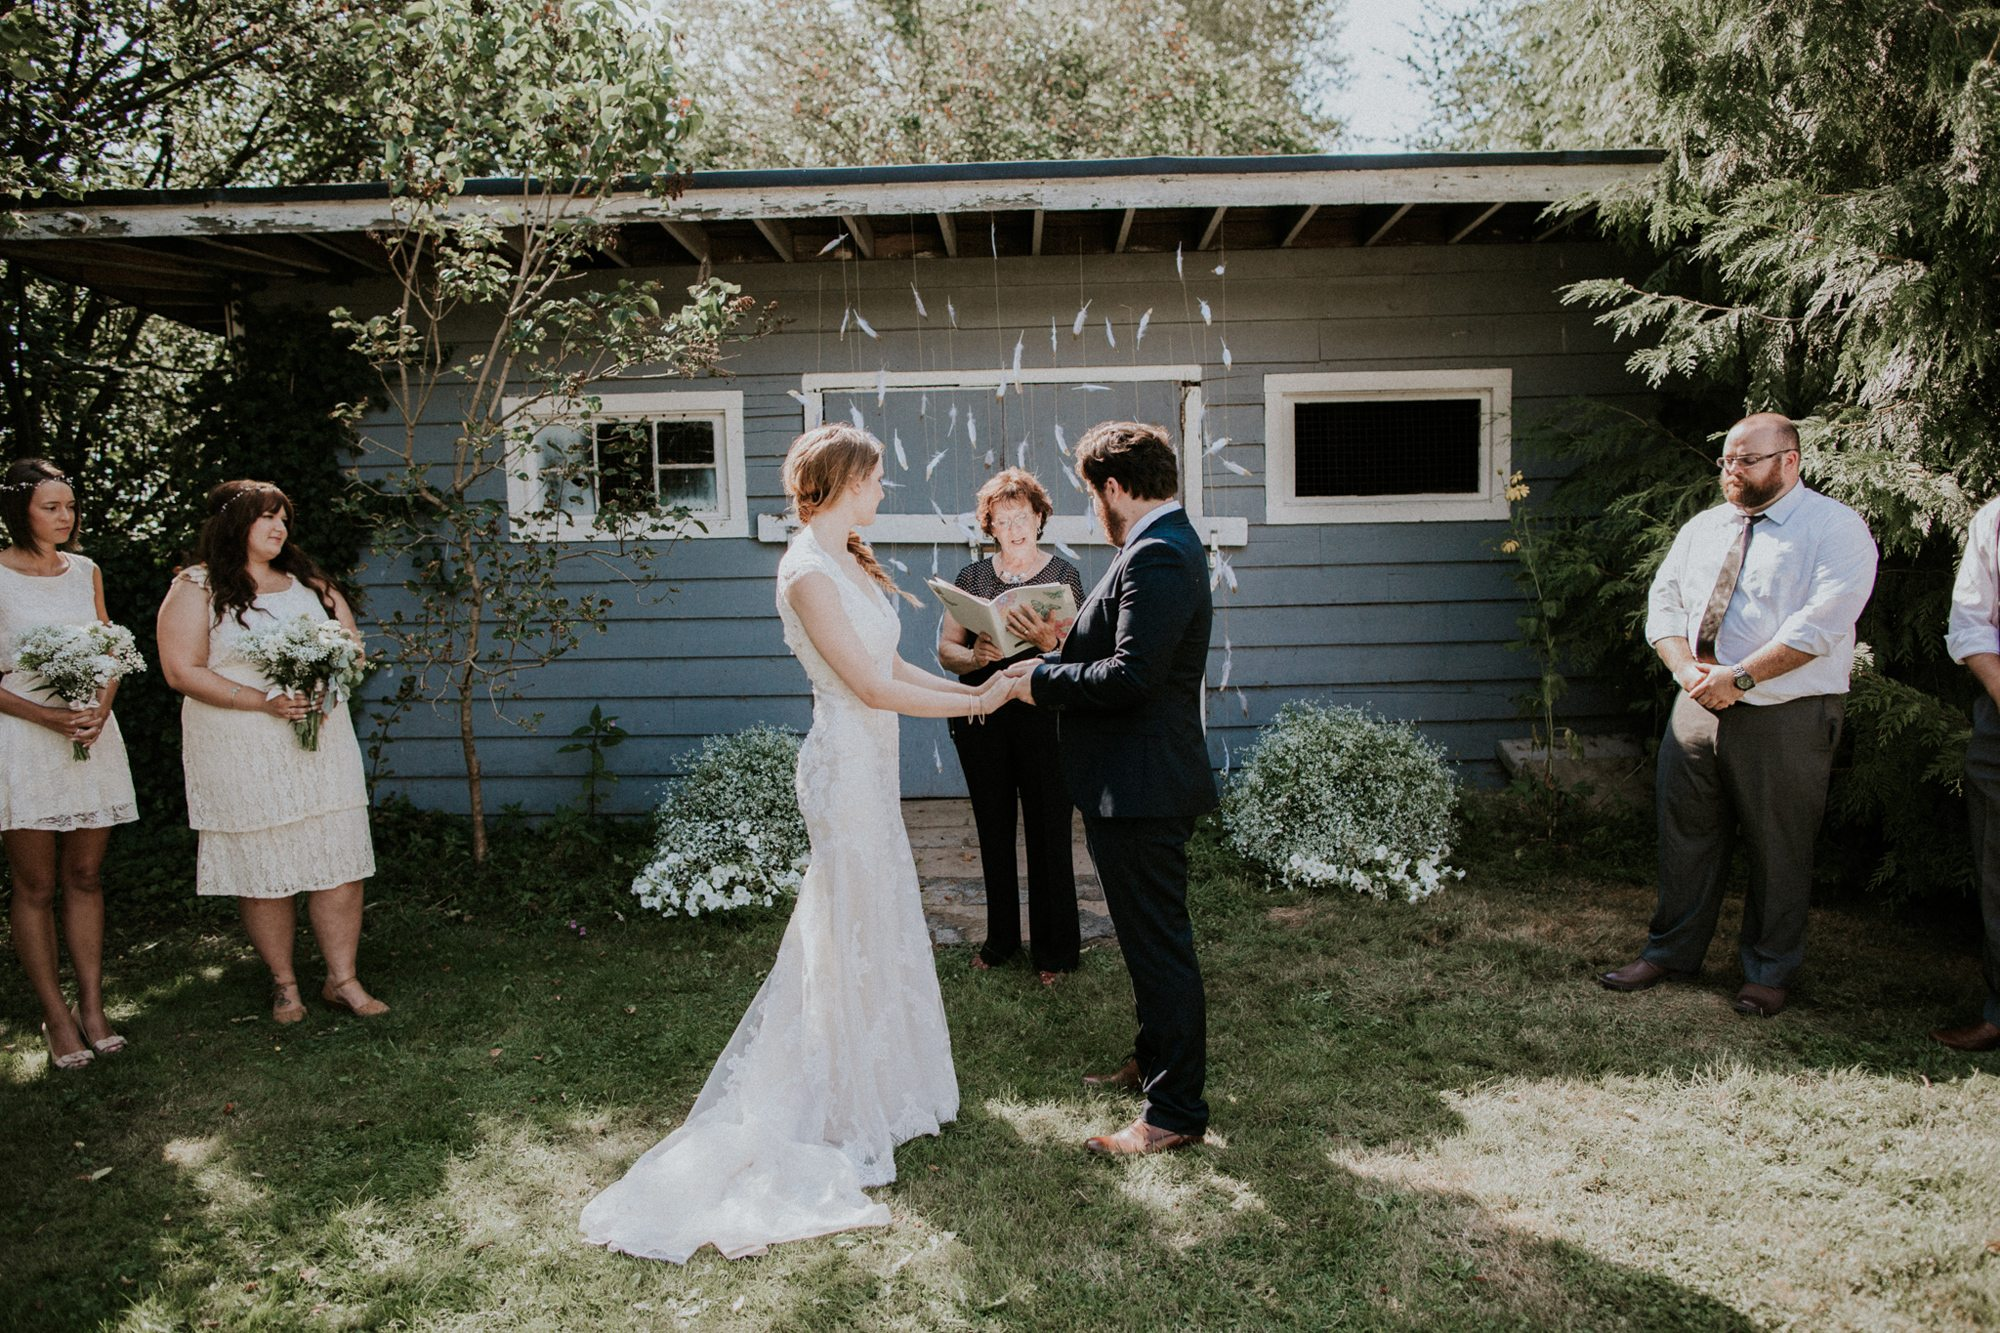 830-abbotsford-wedding-photographer